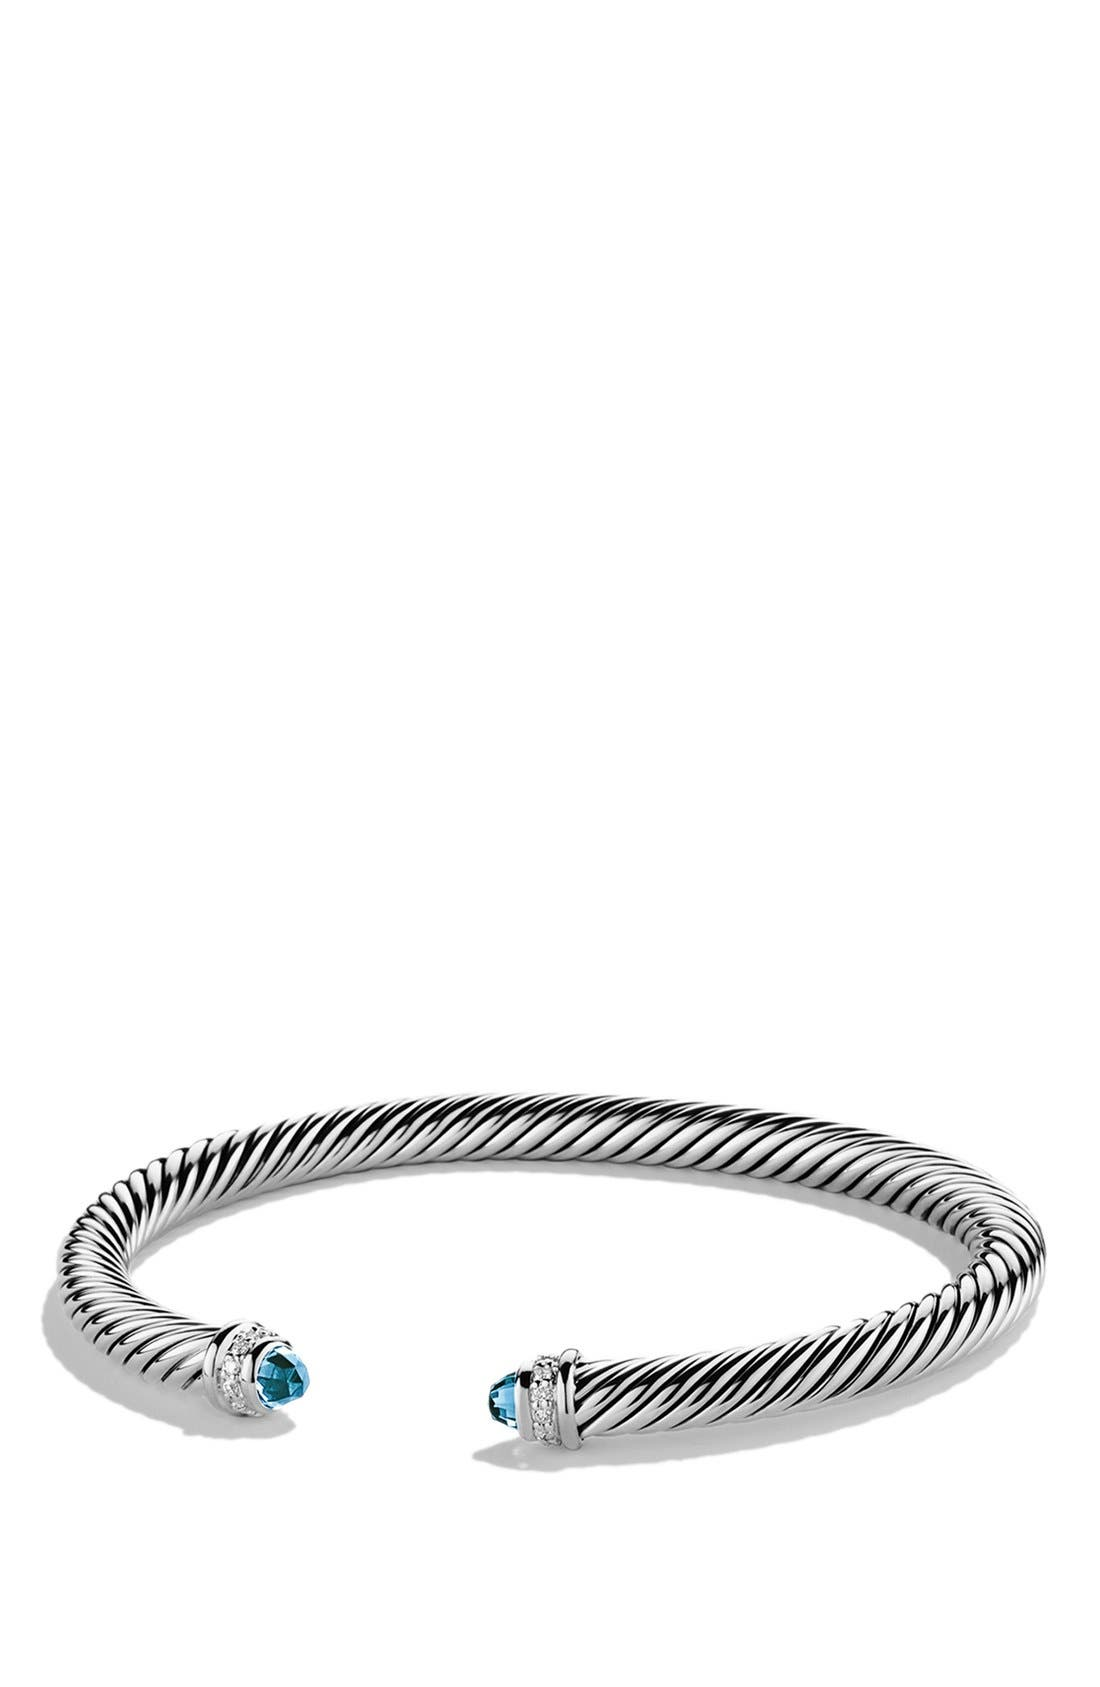 Alternate Image 1 Selected - David Yurman 'Cable Classics' Bracelet with Semiprecious Stones & Diamonds